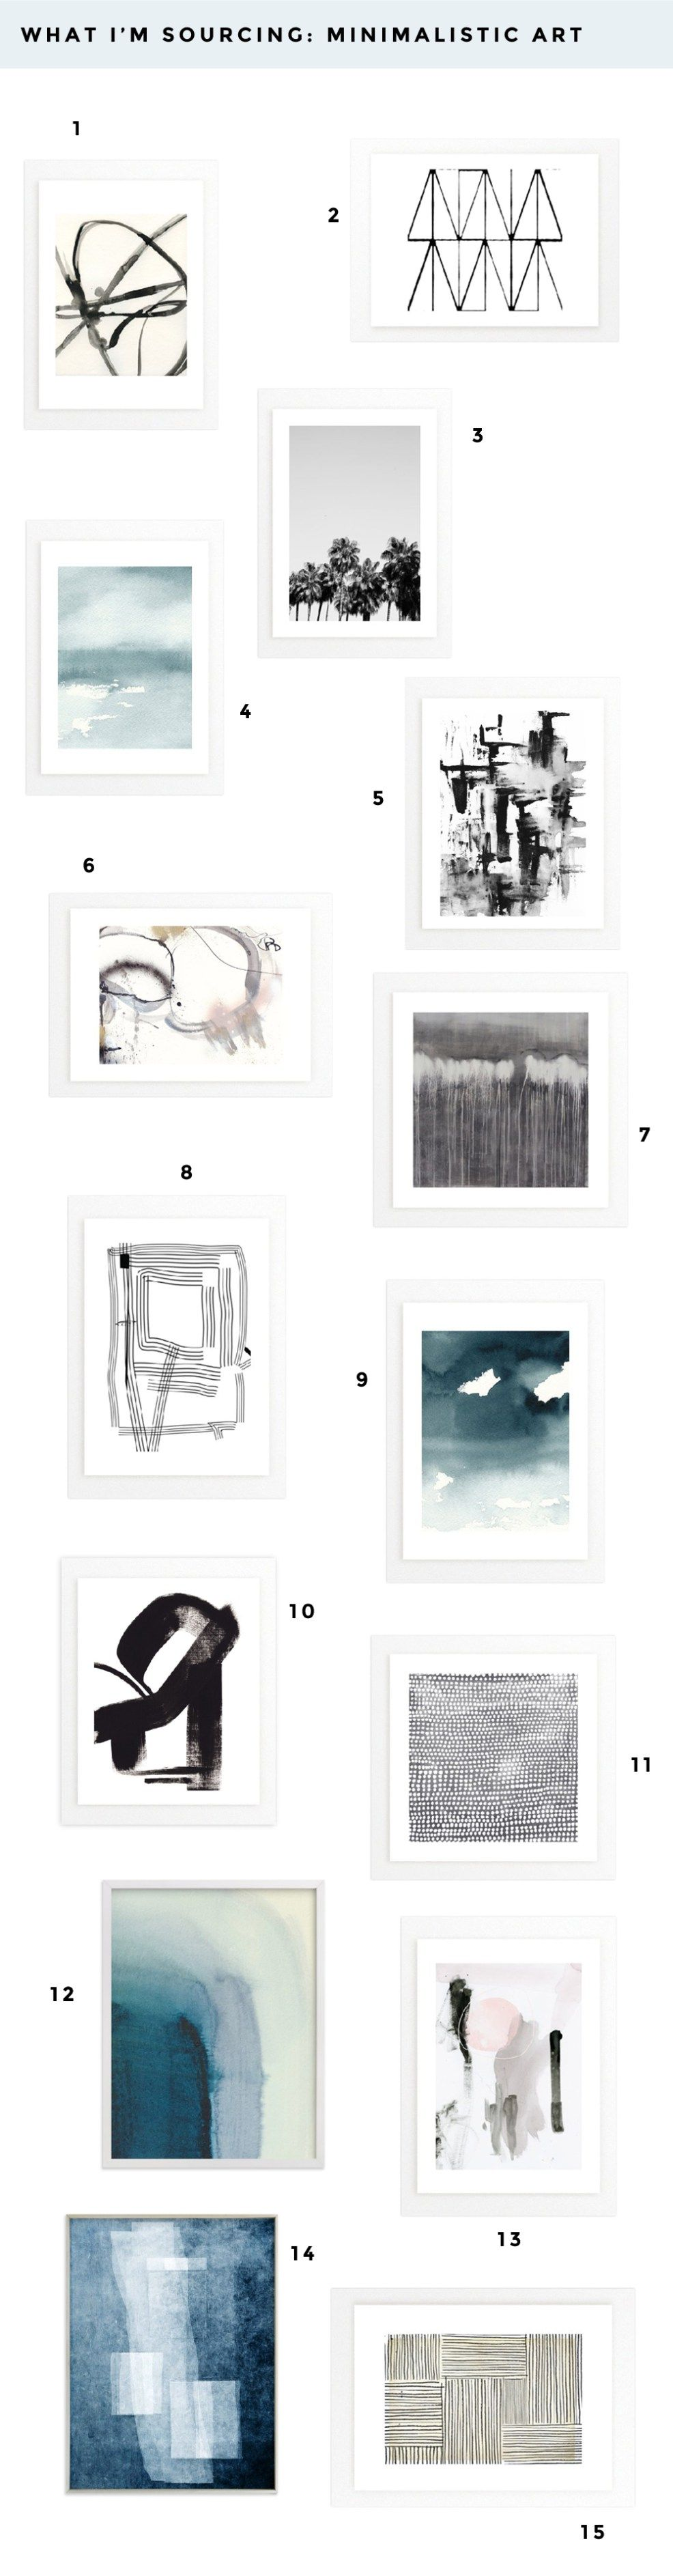 sourcing-minimalistic art